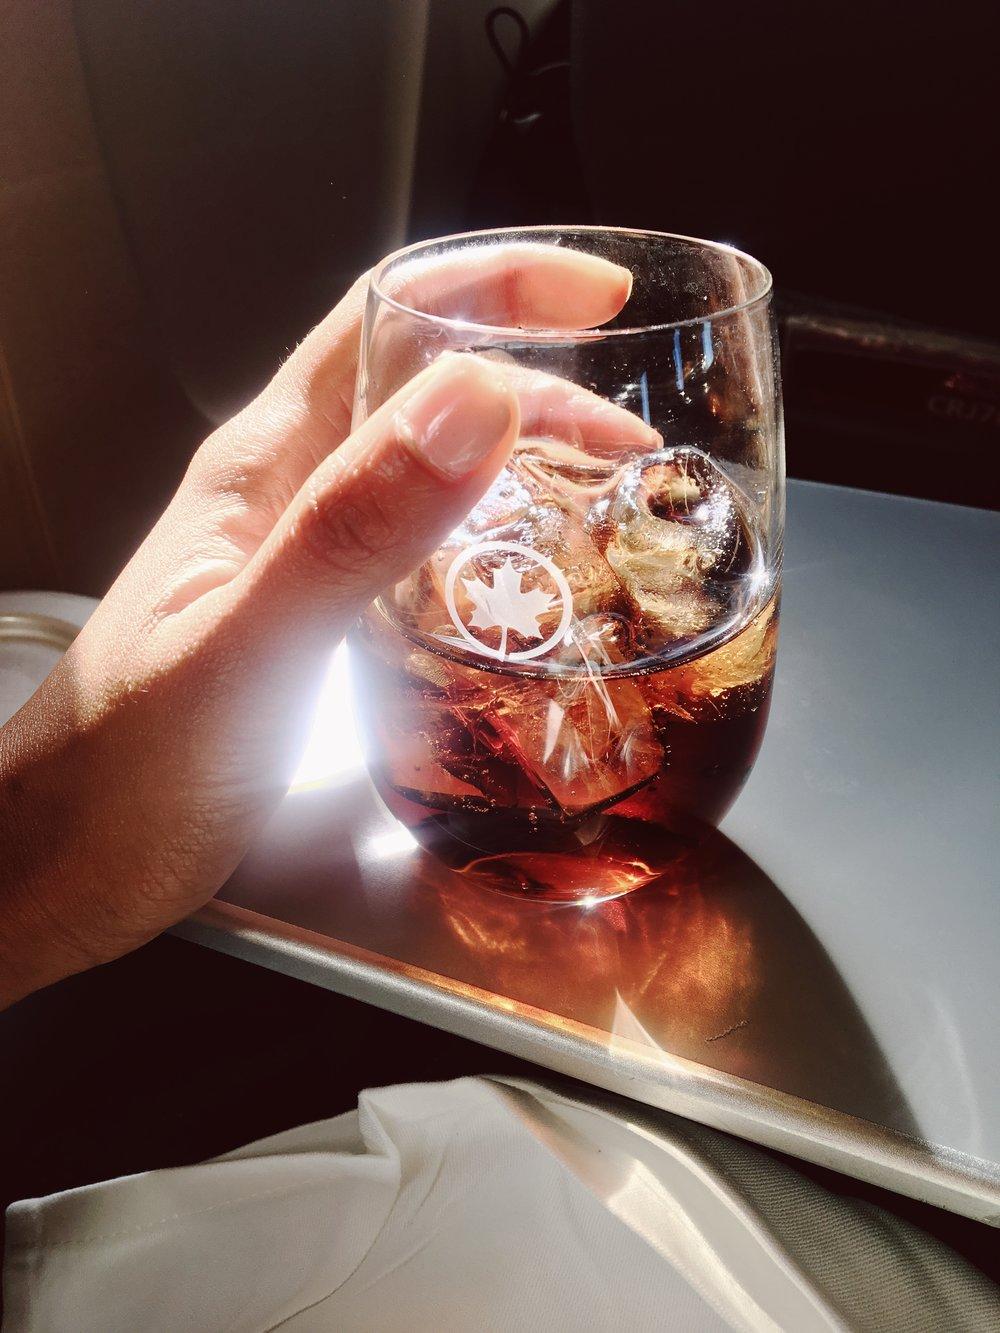 Airplane soda is a simple joy.